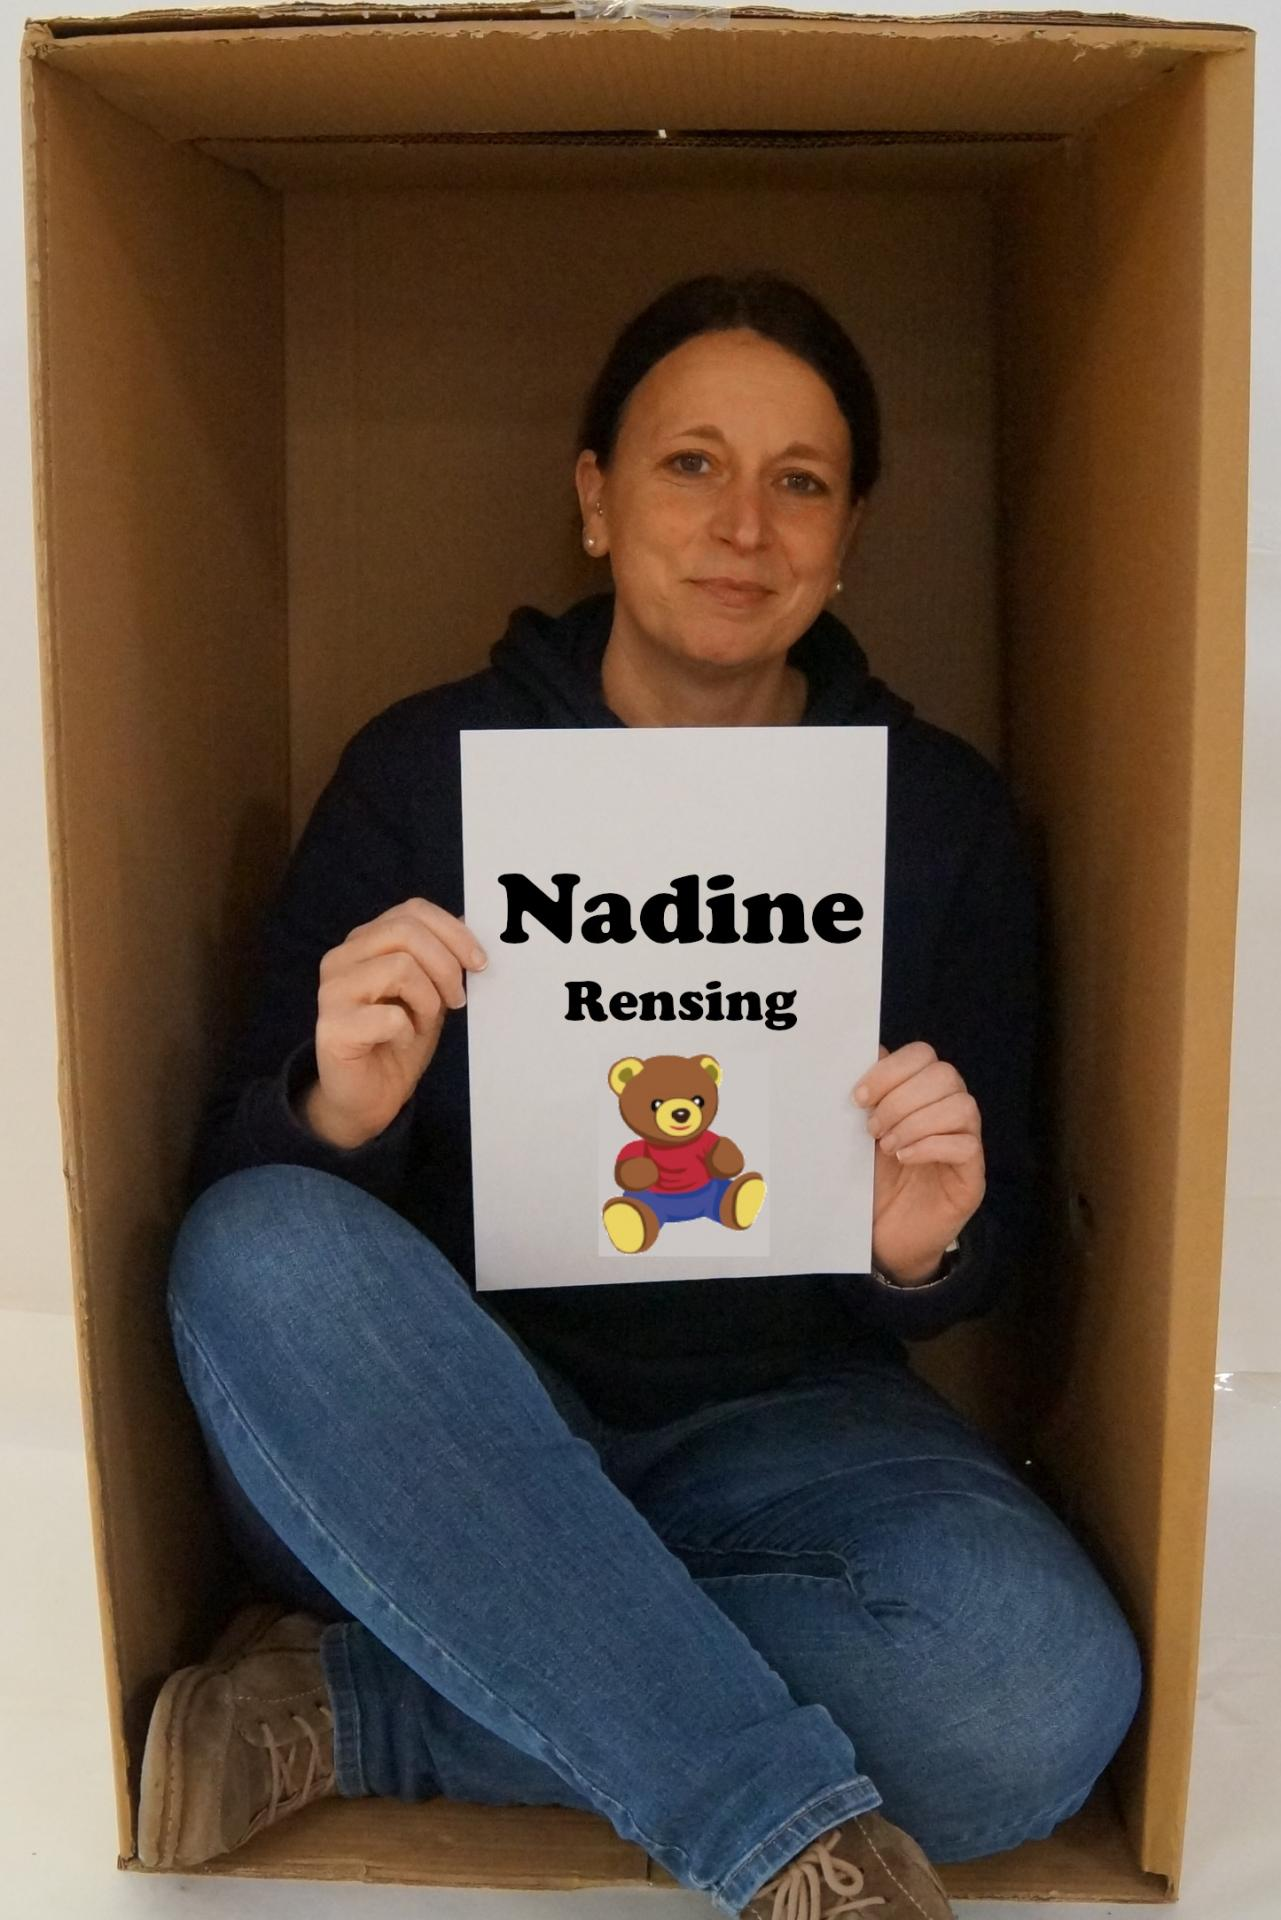 Nadine Rensing